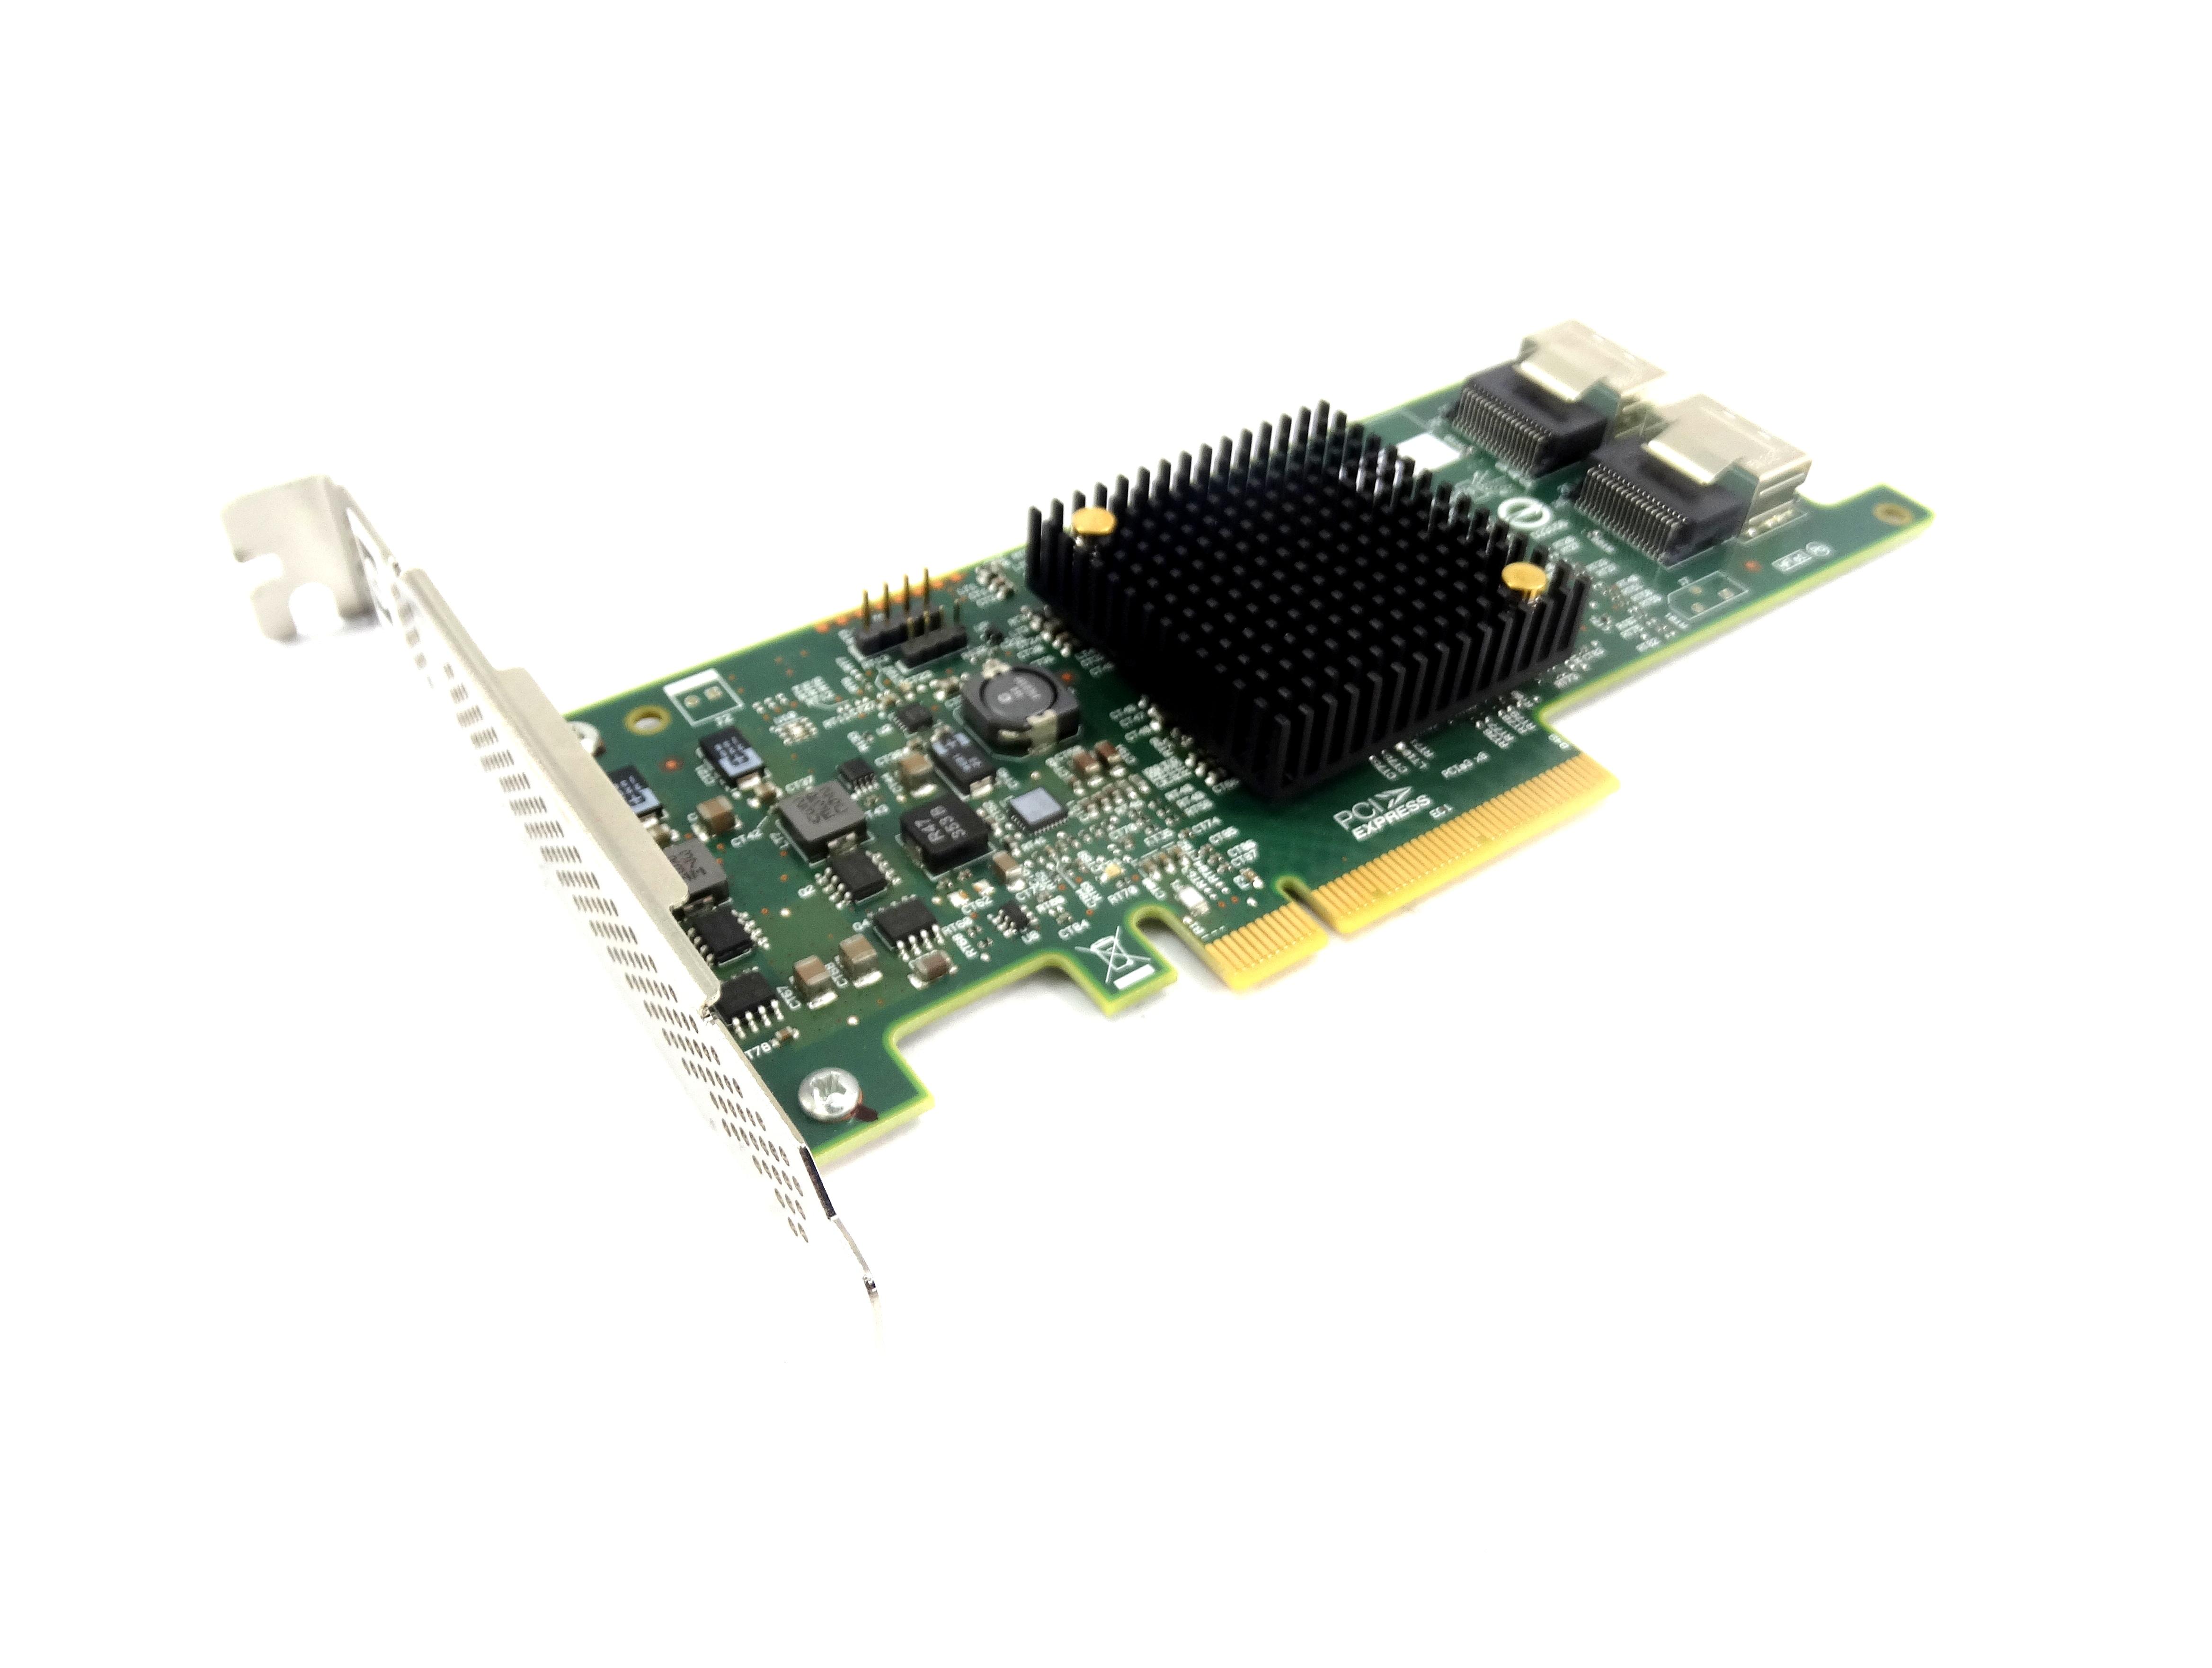 HP H220 SAS 9205-8I DUAL PORT 6GBPS PCI-E 3.0 X8 HOST BUS ADAPTER (660088-001)